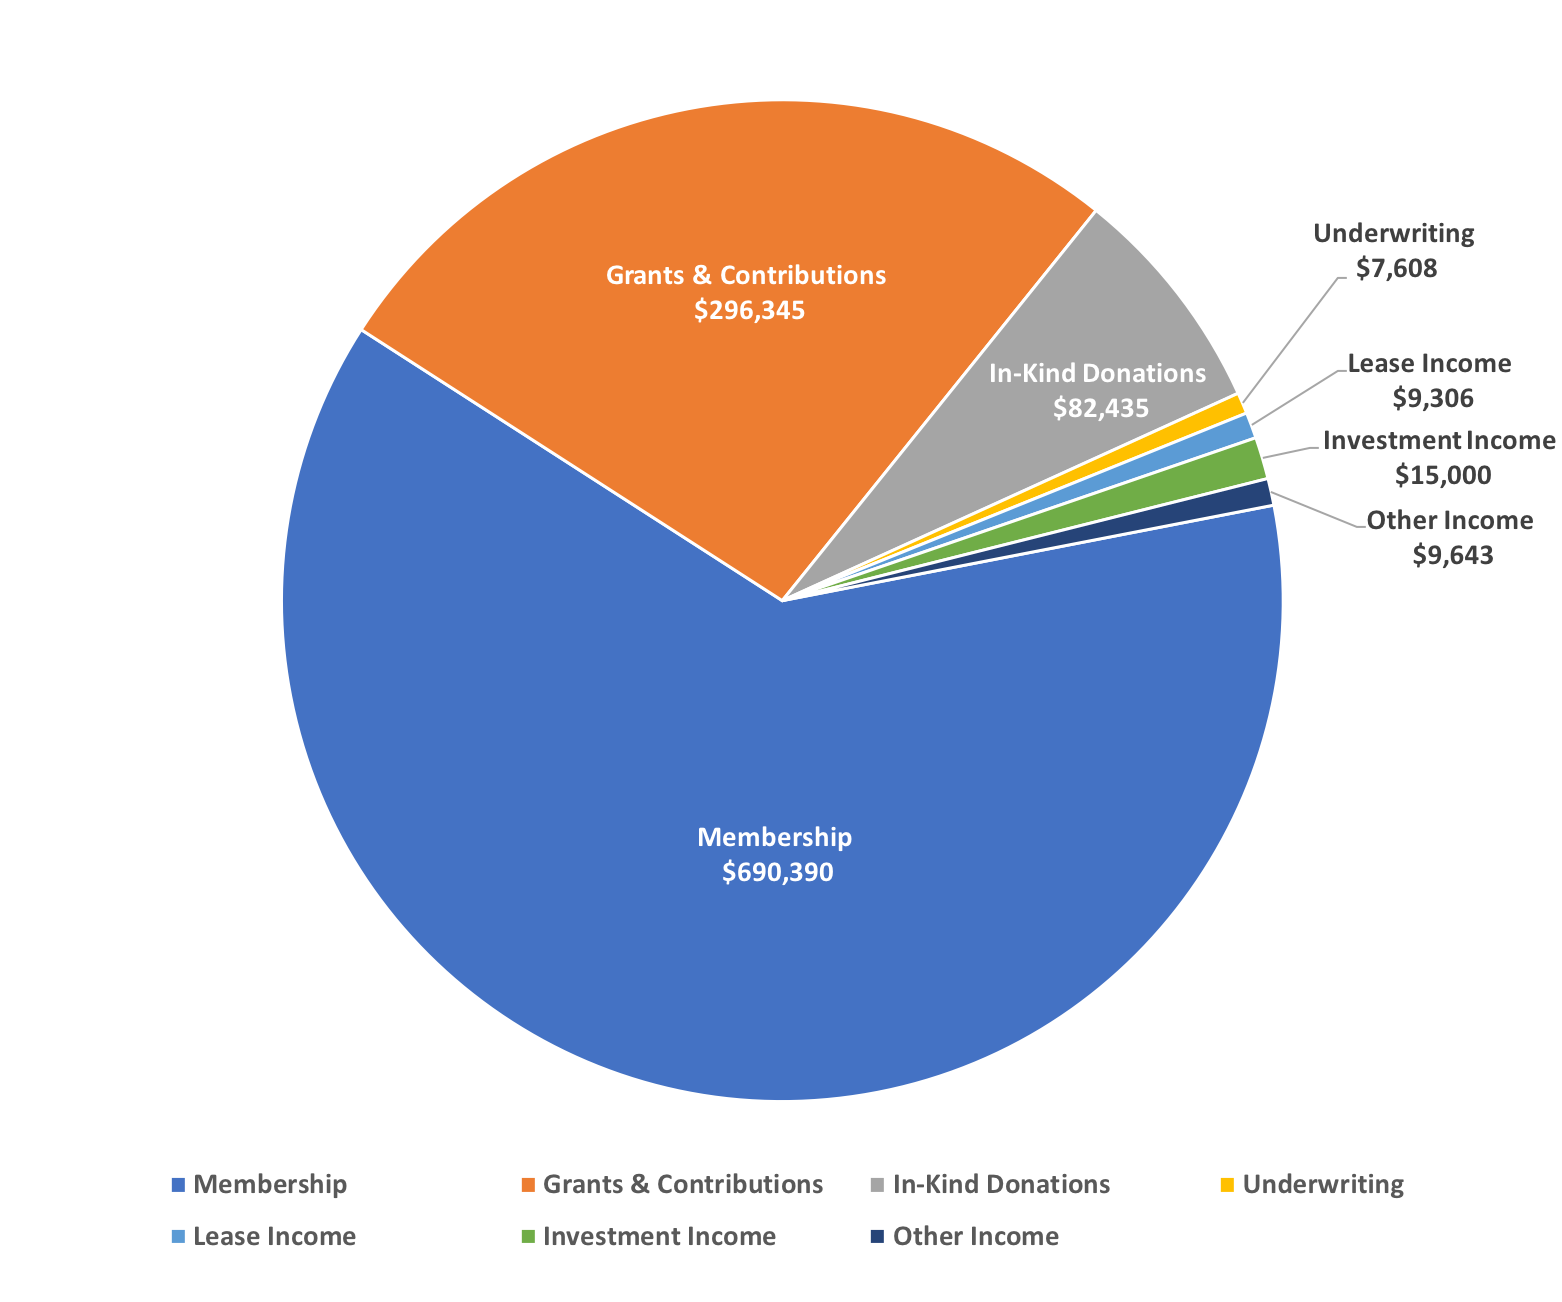 Pie chart of annual revenue